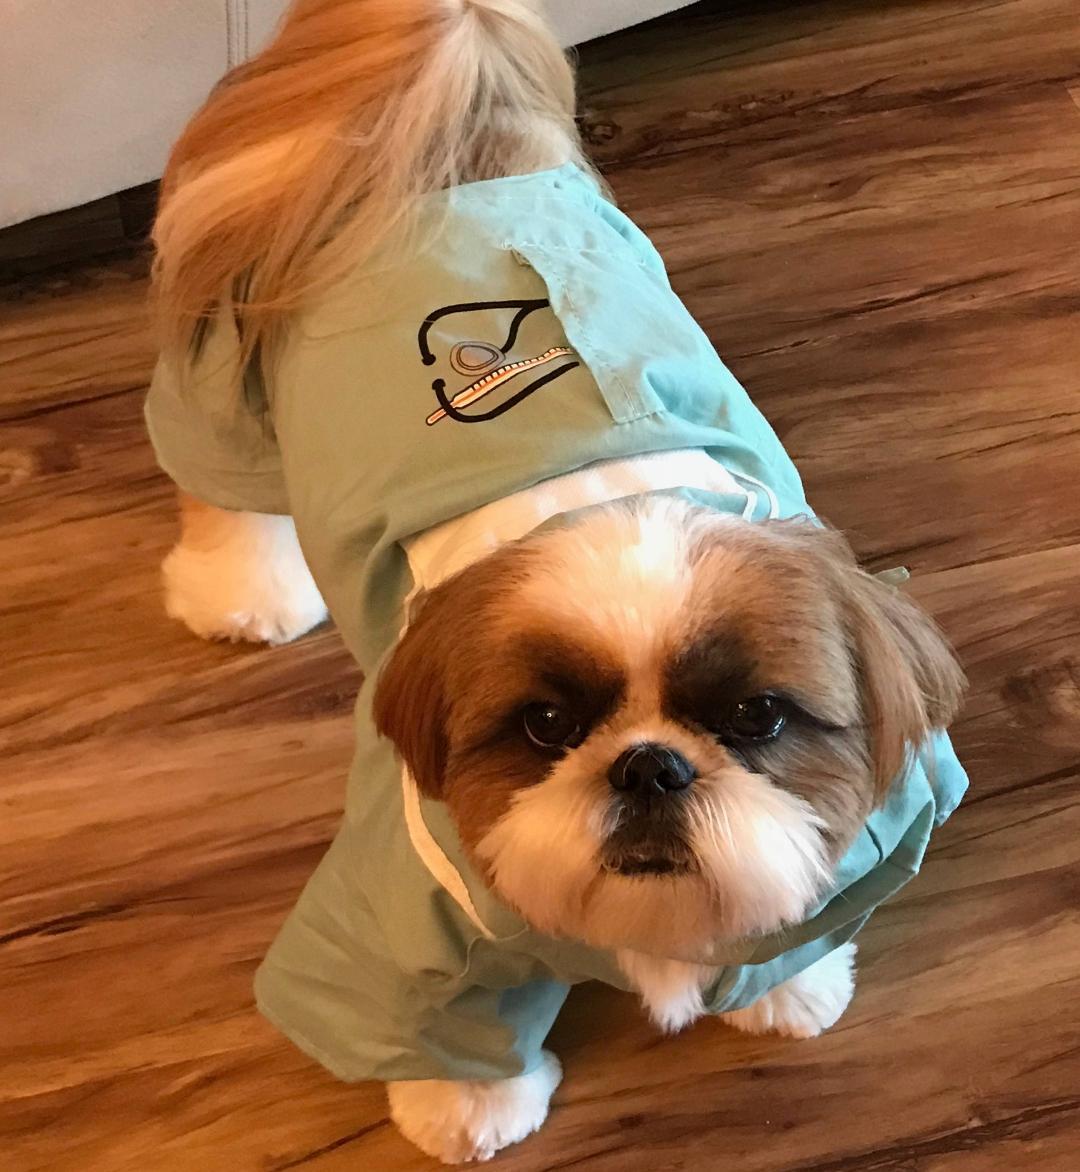 Devalon Shih Tzu | Breeders Puppies for Sale Florida